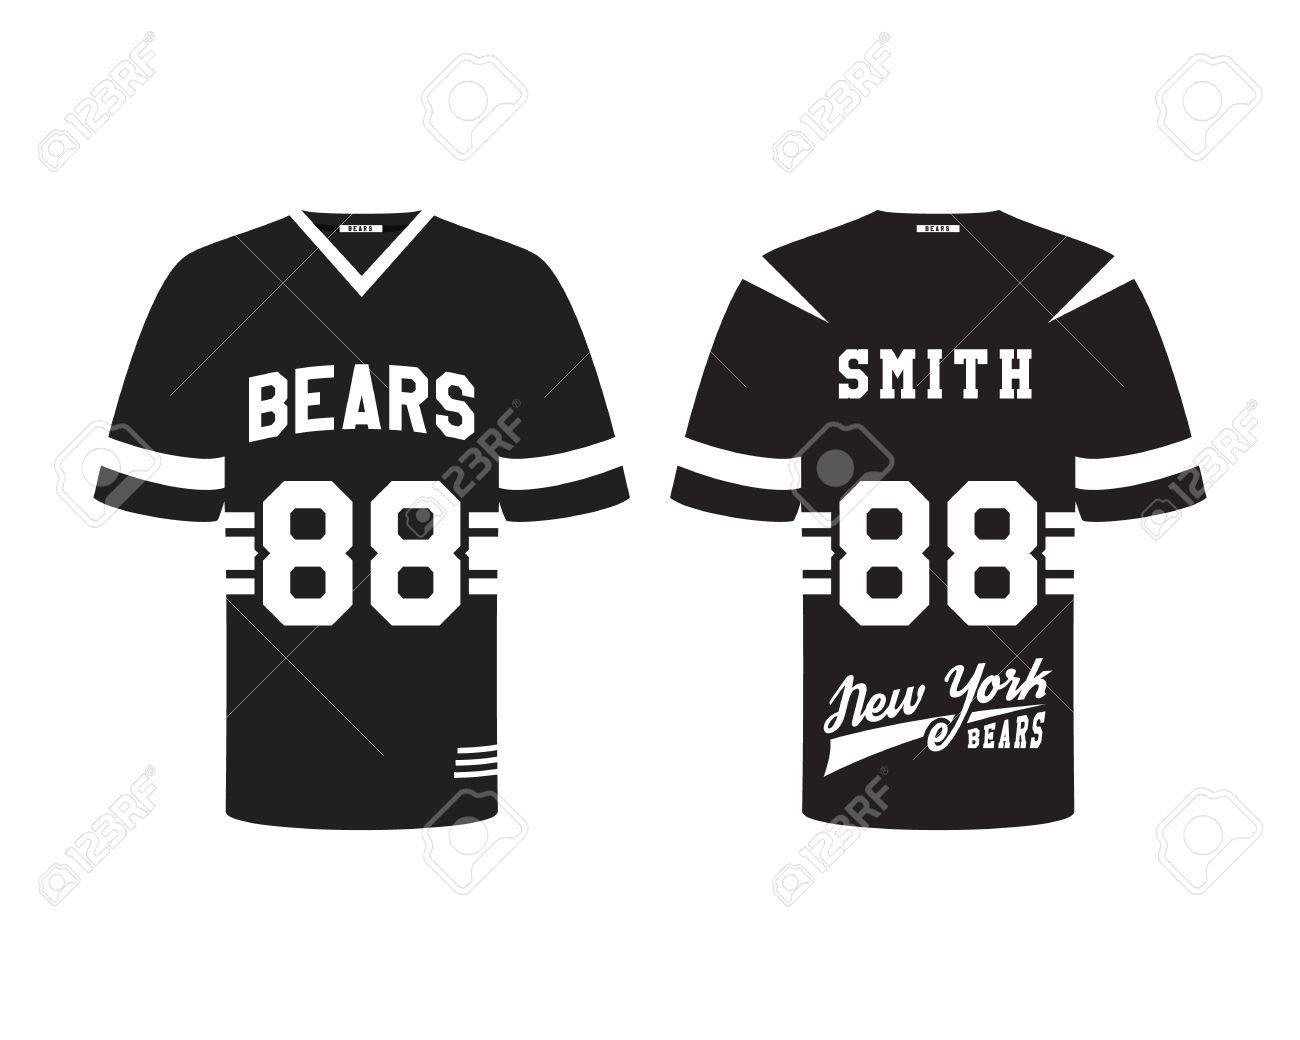 T shirt design 2 zeixs - Design T Shirt Label T Shirt Design With Team Logo Label Badge Download